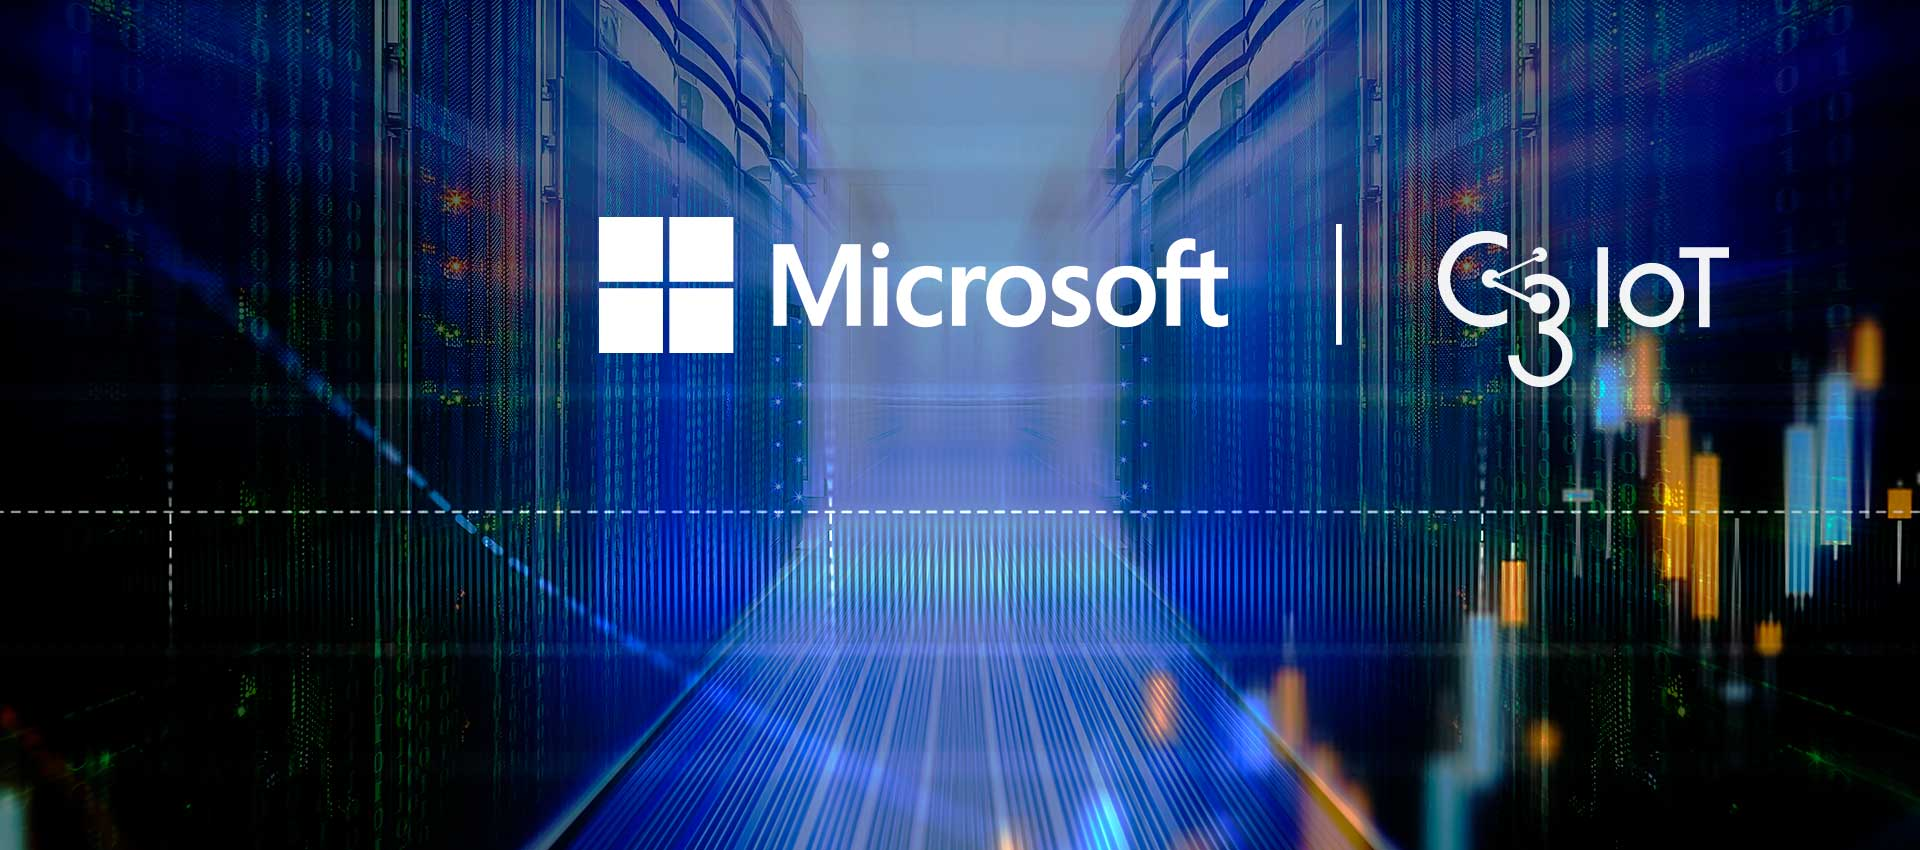 C3 - Microsoft Announcement